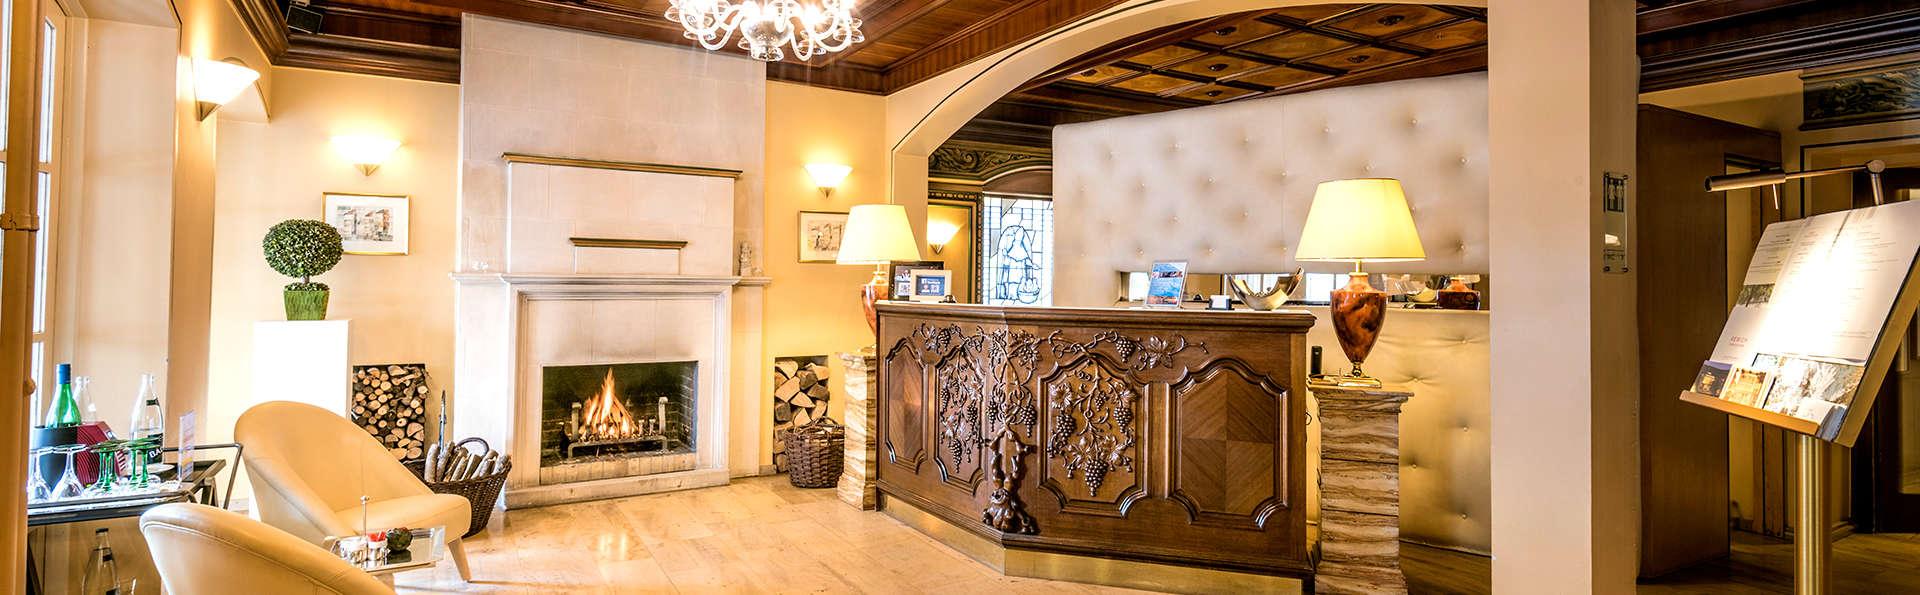 Hotel Saint-Nicolas & Spa - Edit_Reception.jpg